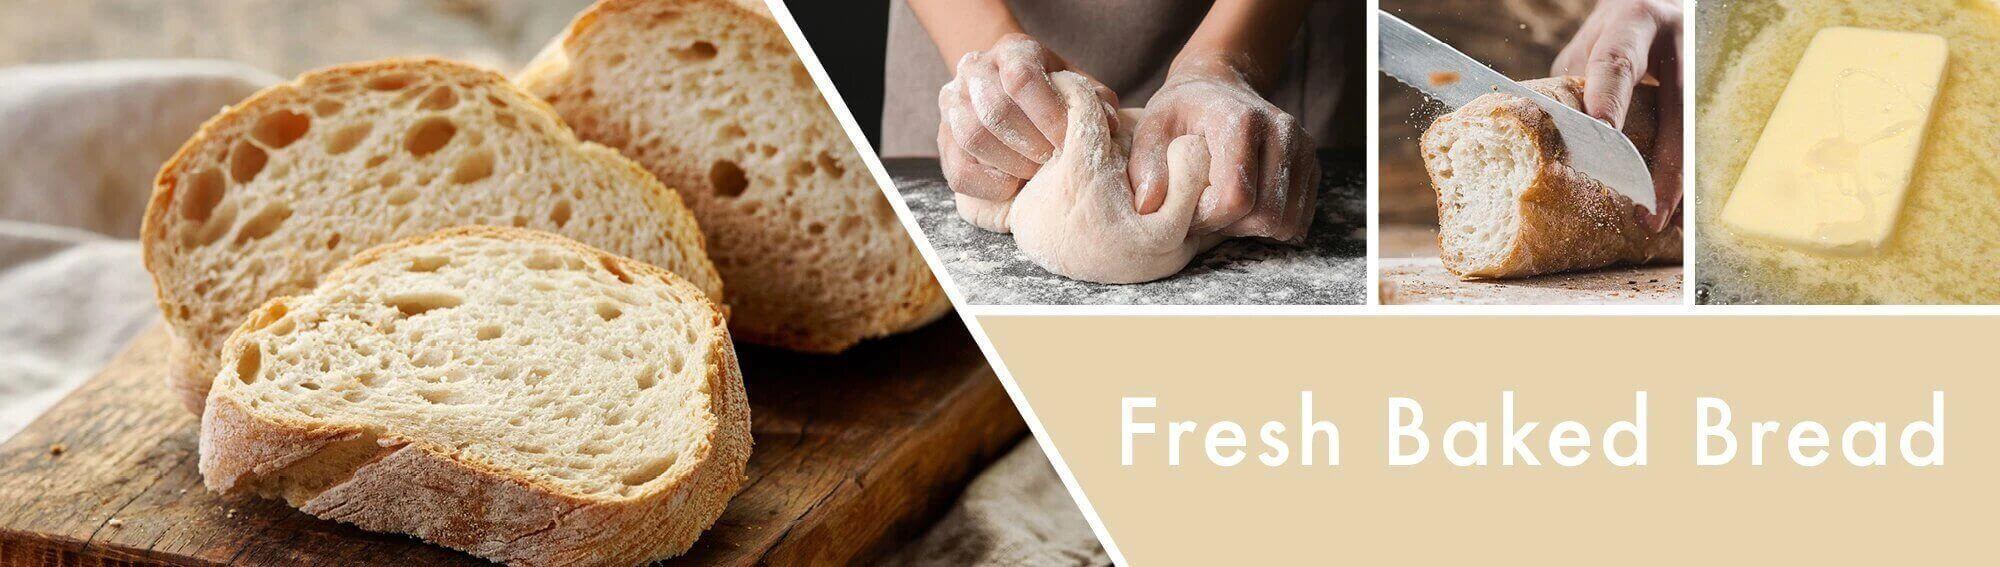 Fresh-Baked-Bread-Candle-FragranceGtiDVzqk6Wnp4